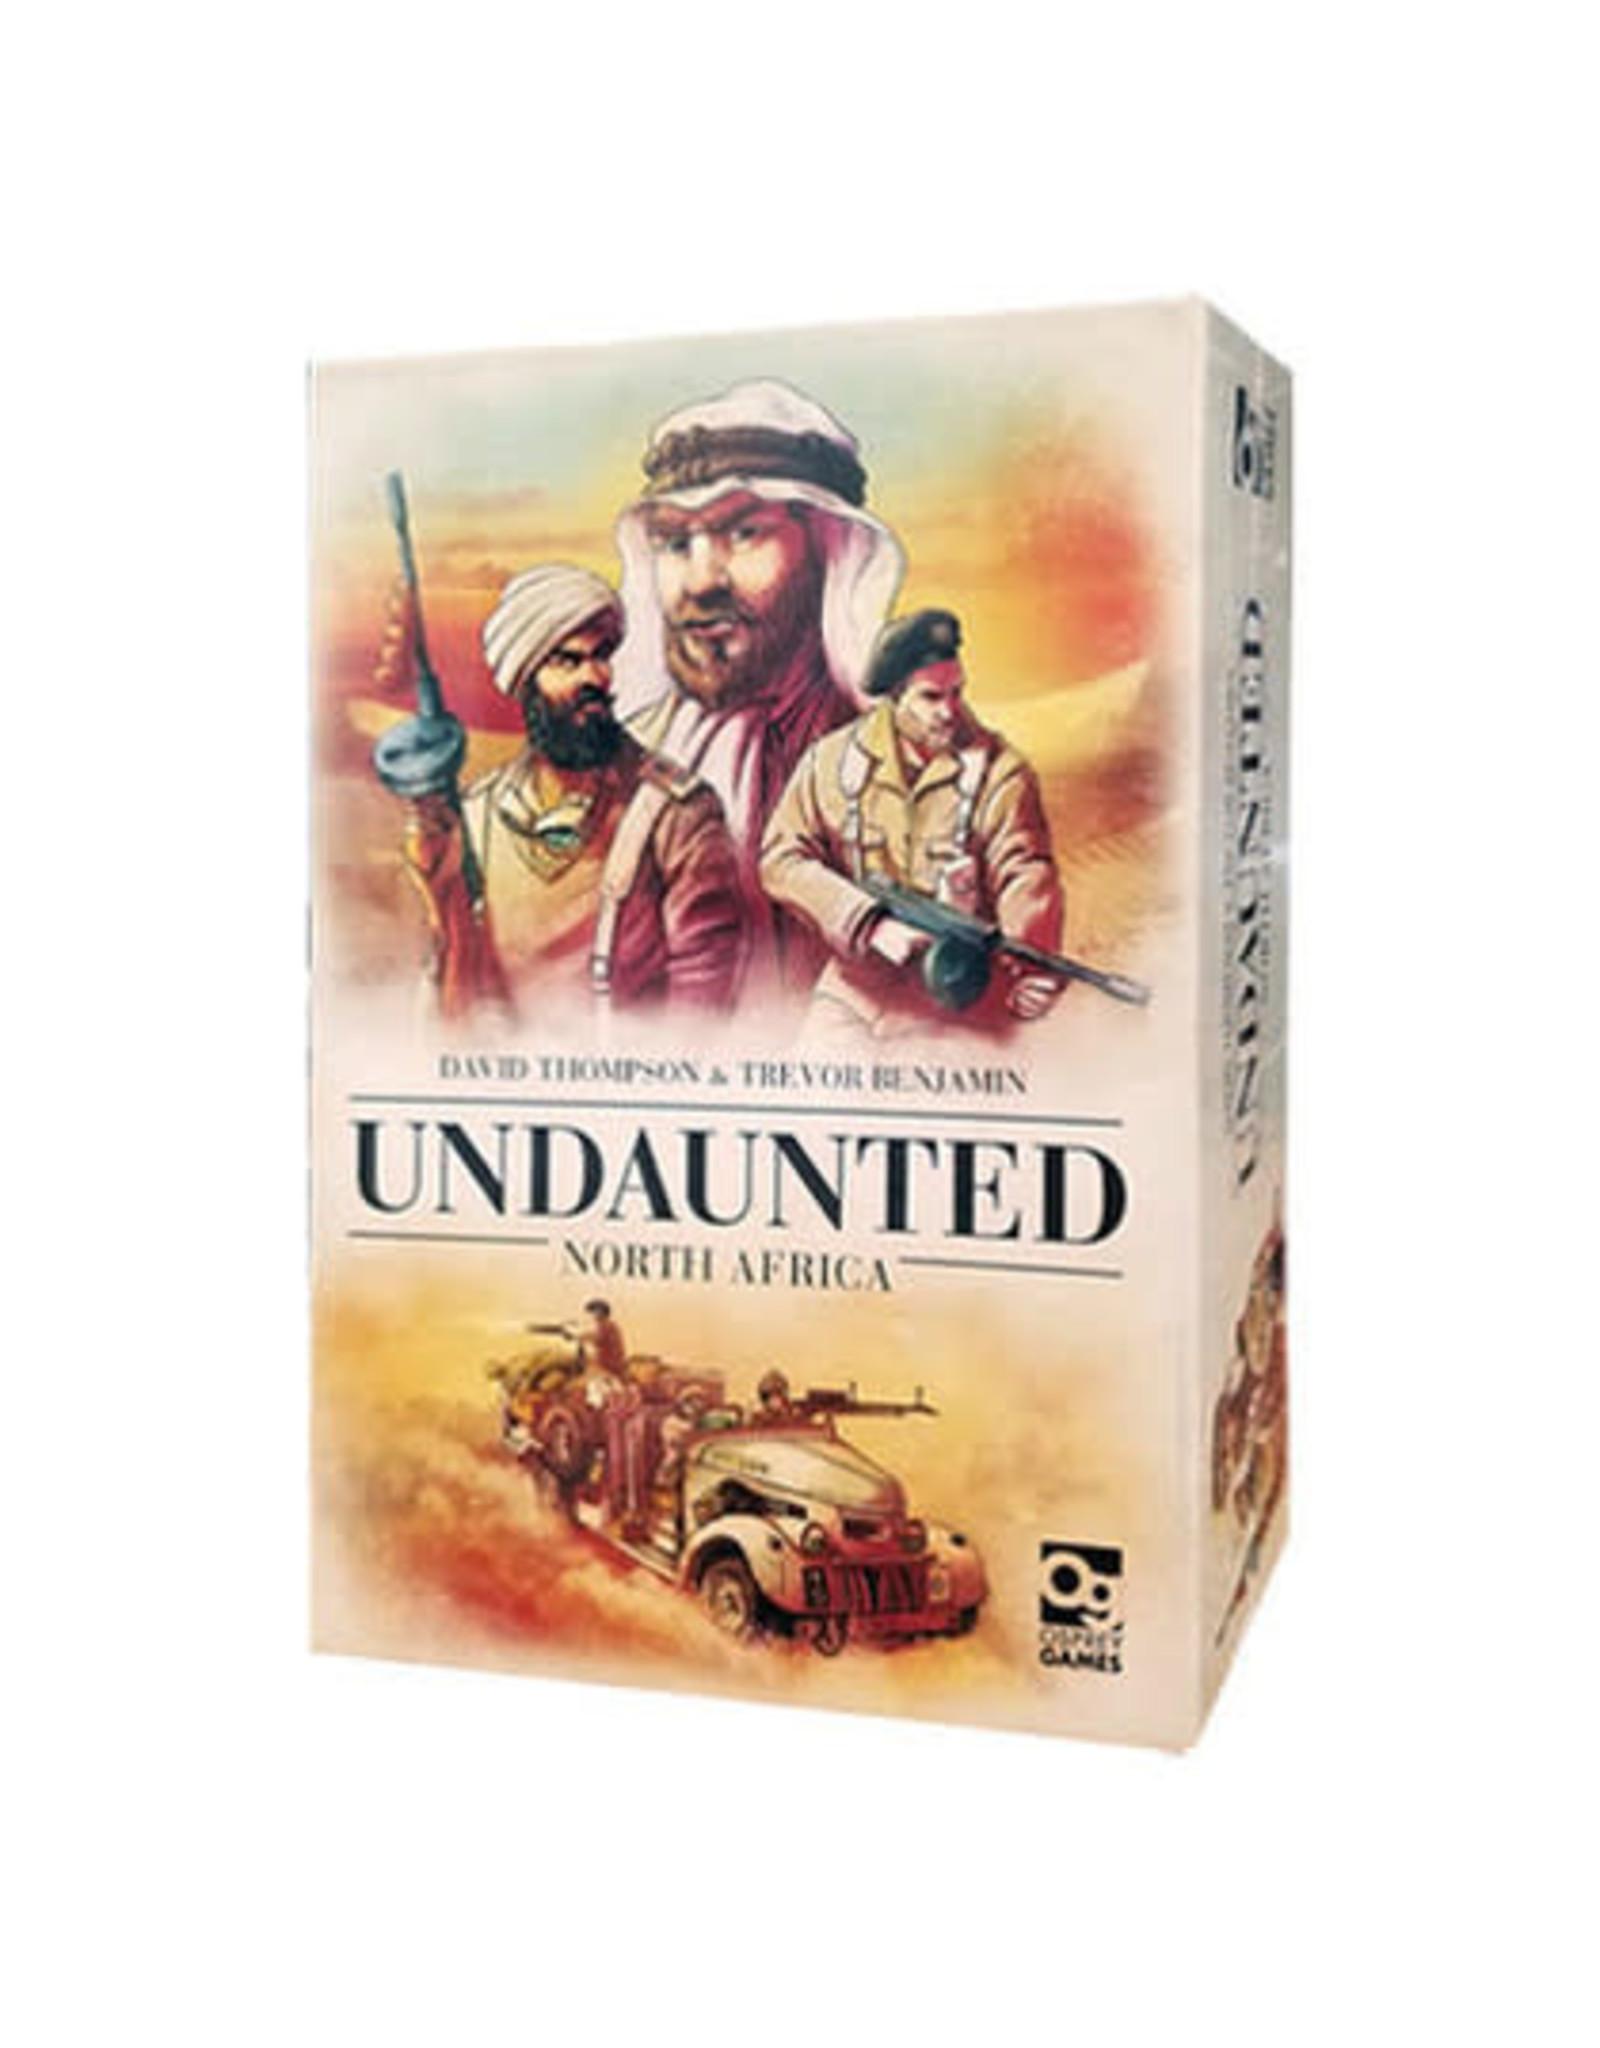 Undaunted: North Africa